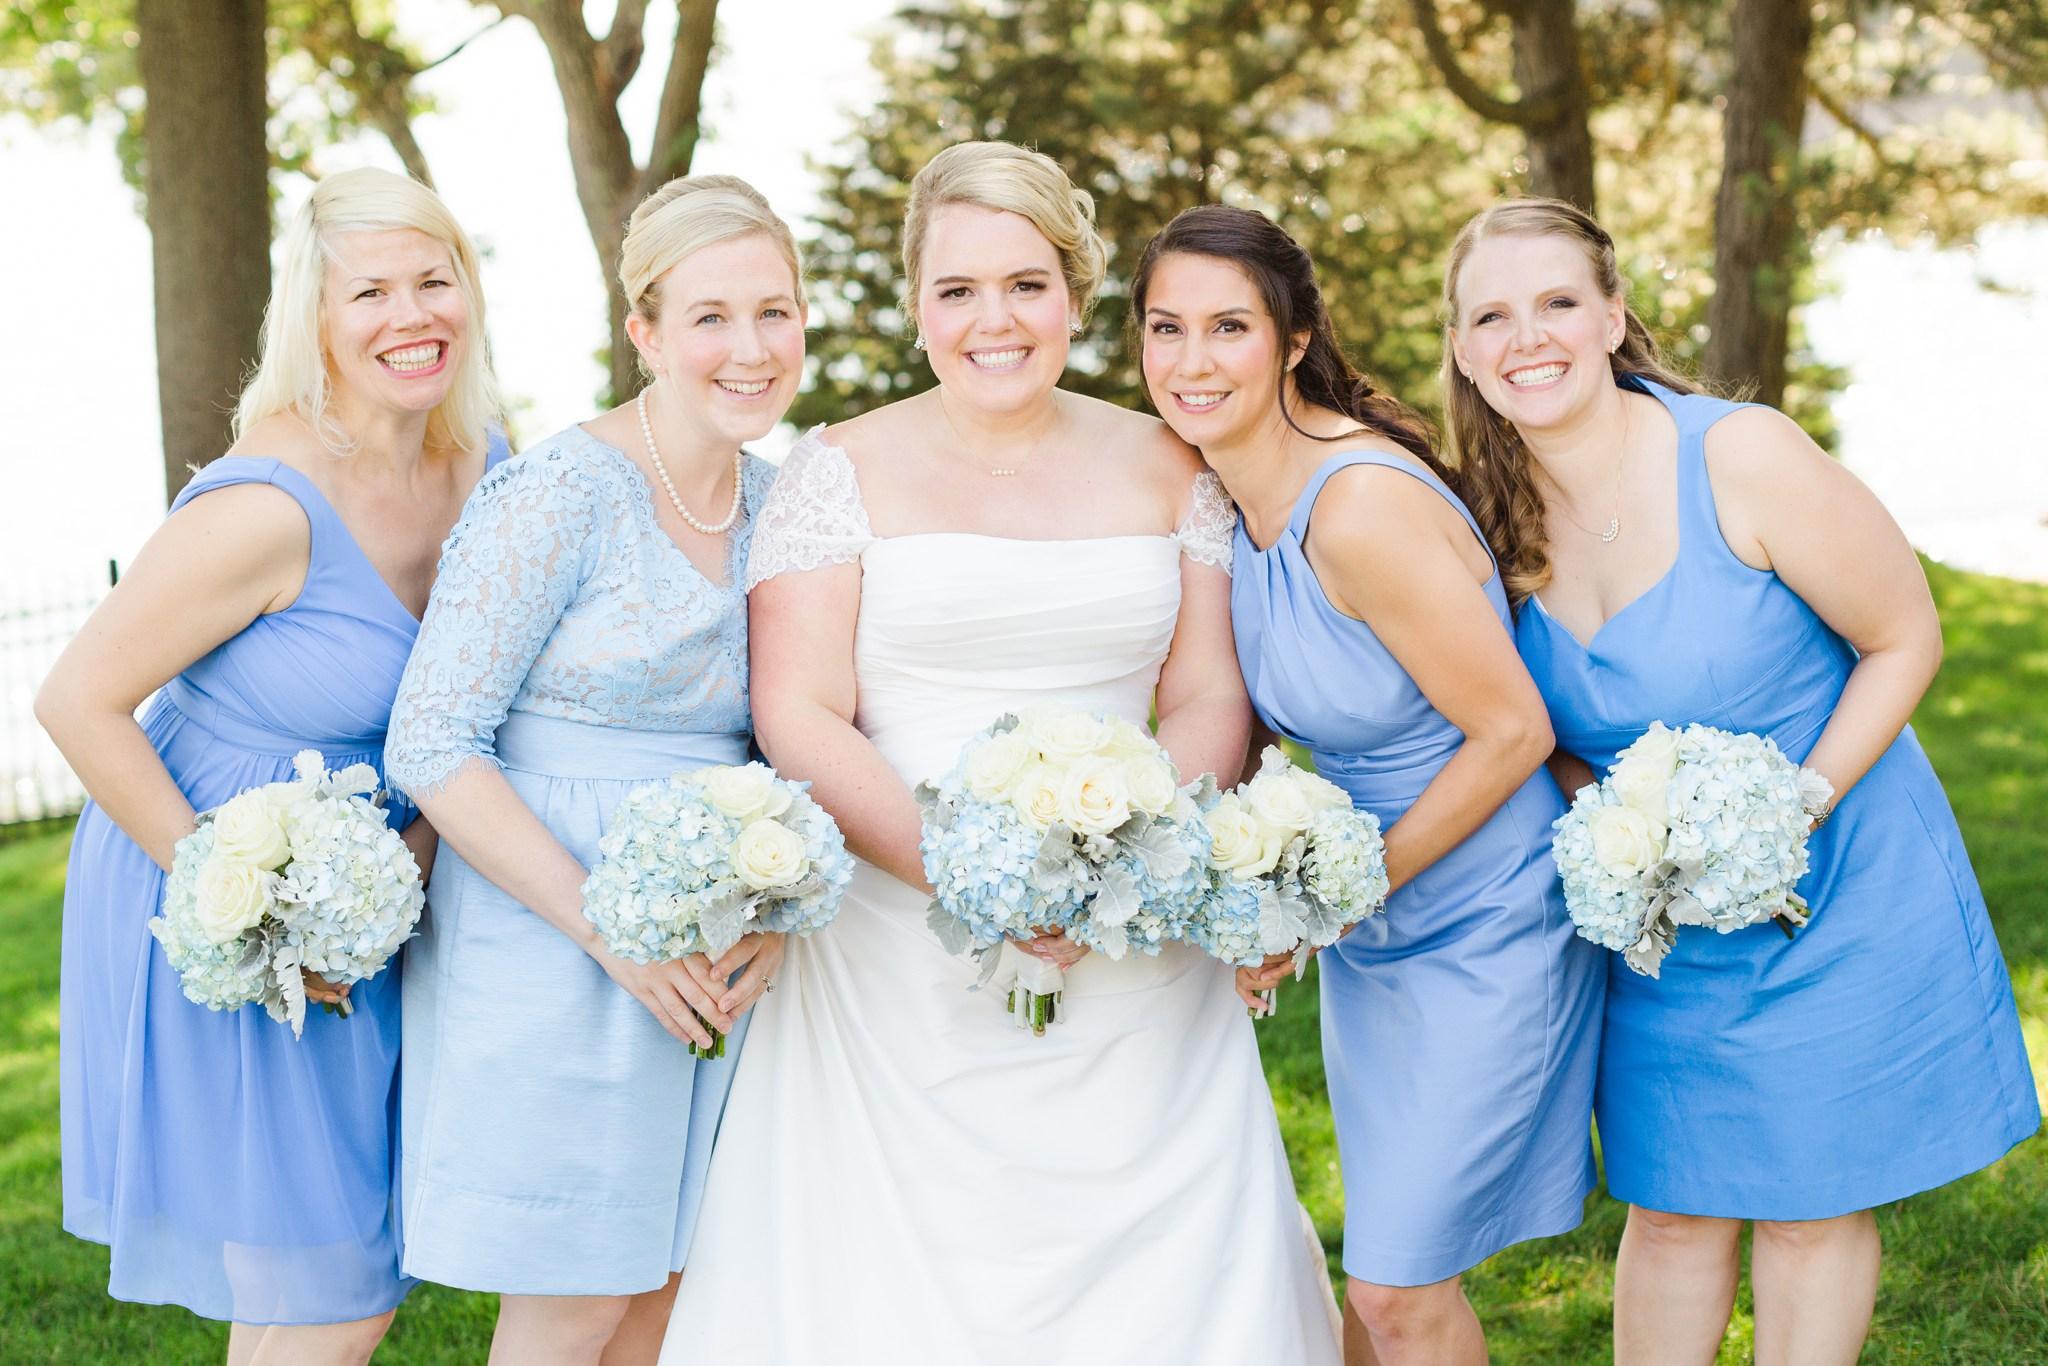 misselwood_endicott_college_wedding_photos_00035.JPG